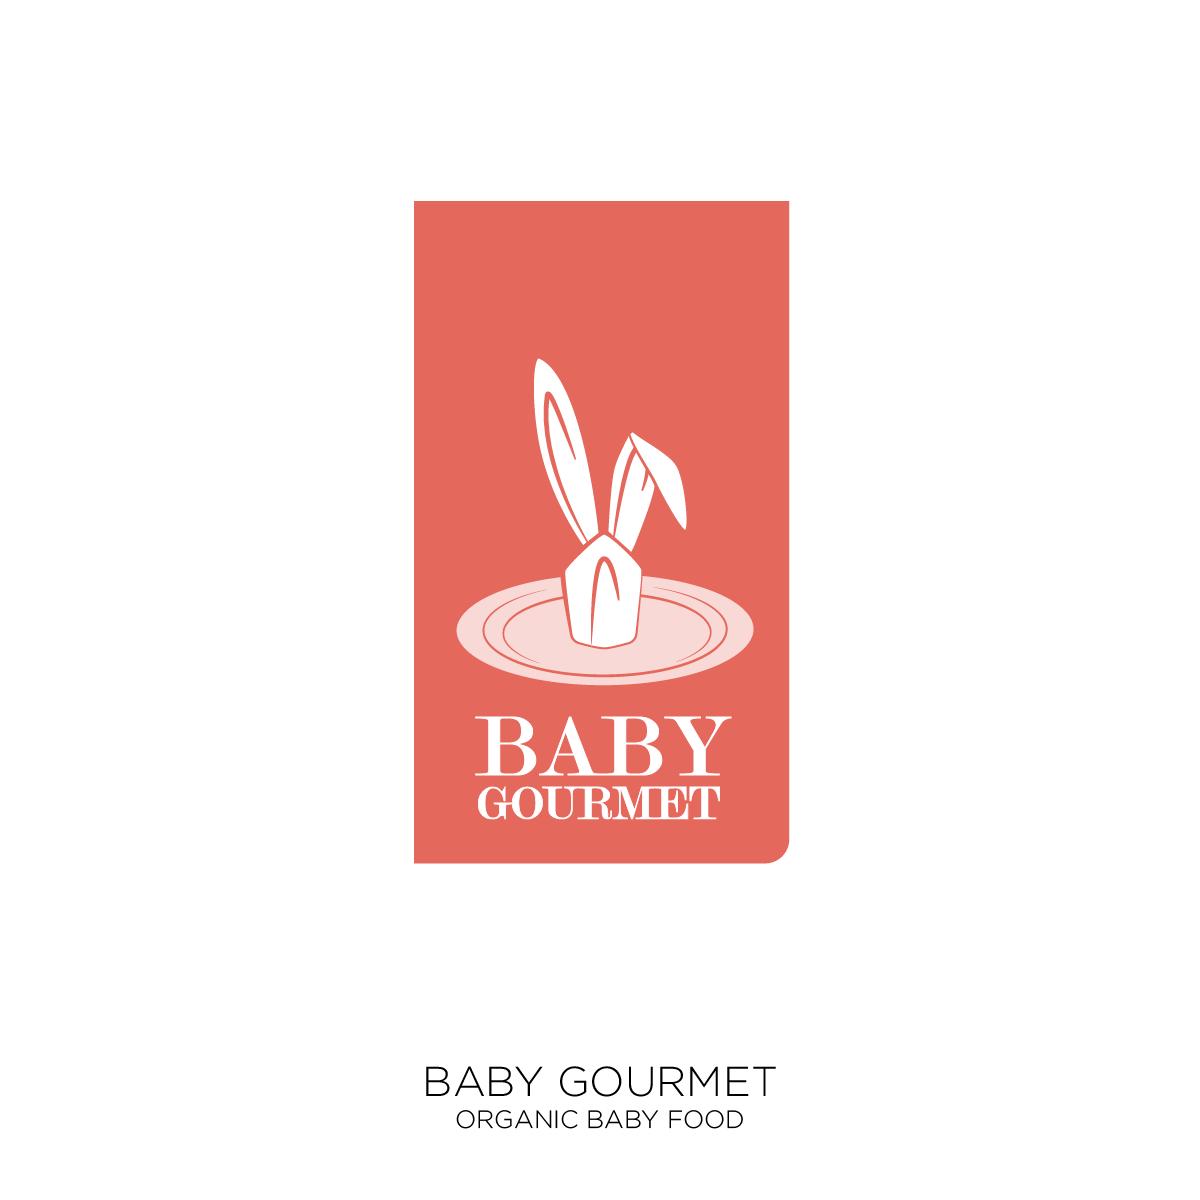 Baby gourmet logo-01.png